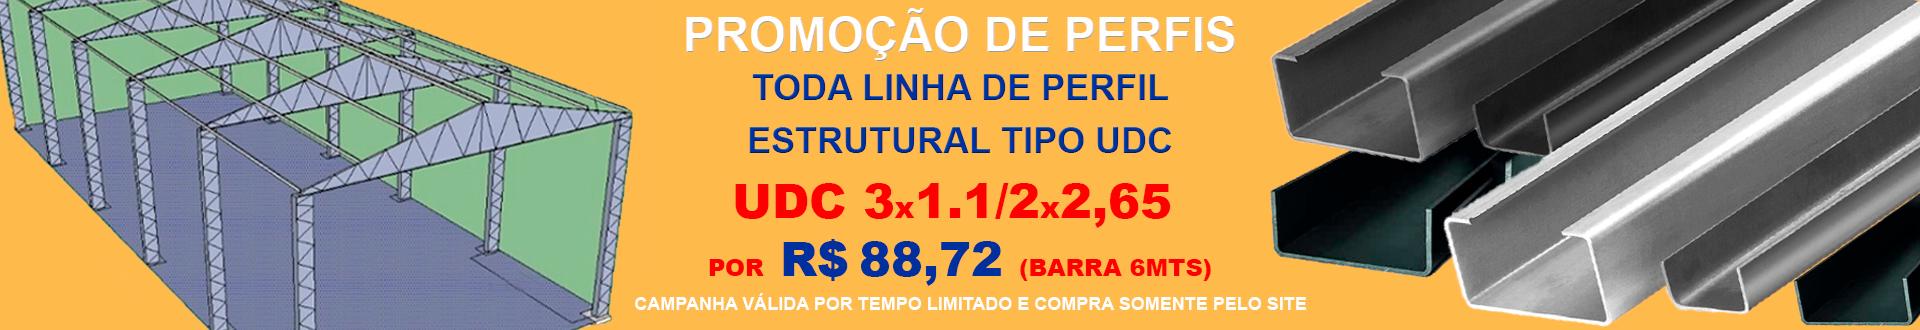 2019-05-28-banner-1920x330-fundo-laranja---desconto-CAMPANHA-MAIO-E-ABRIL-perfil-estrutural-88-72